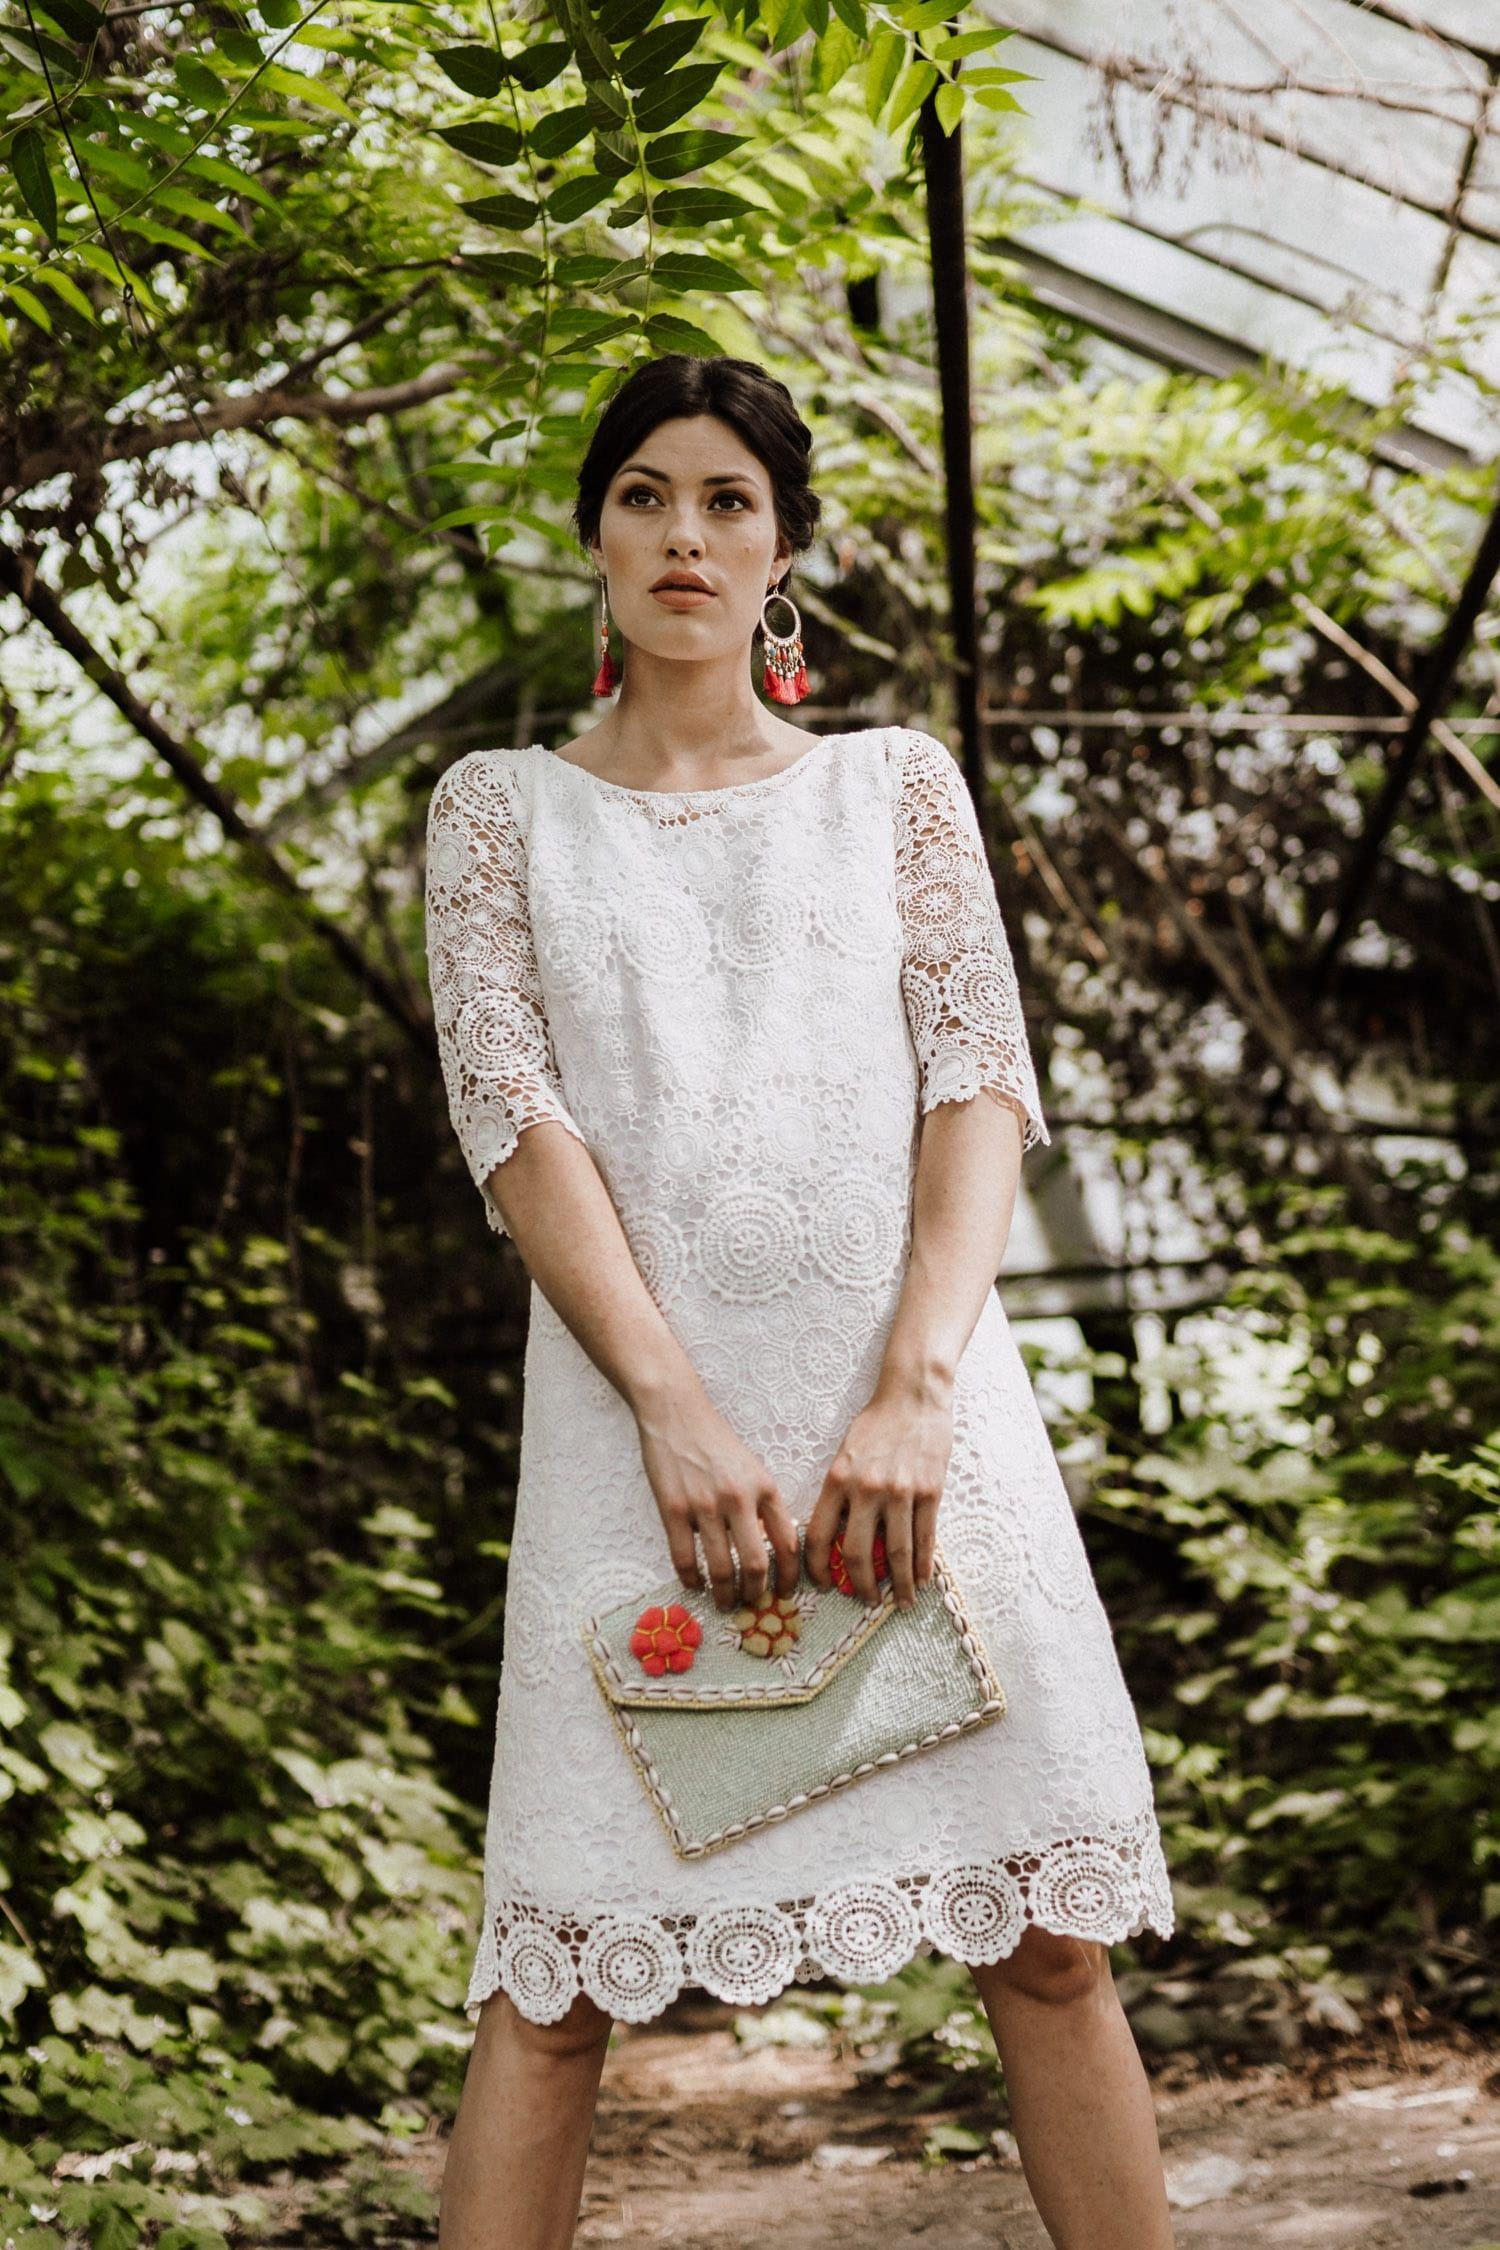 Kurze Hochzeitskleider Köln: Zauberhaft mit Spitze ♥ Boho oder